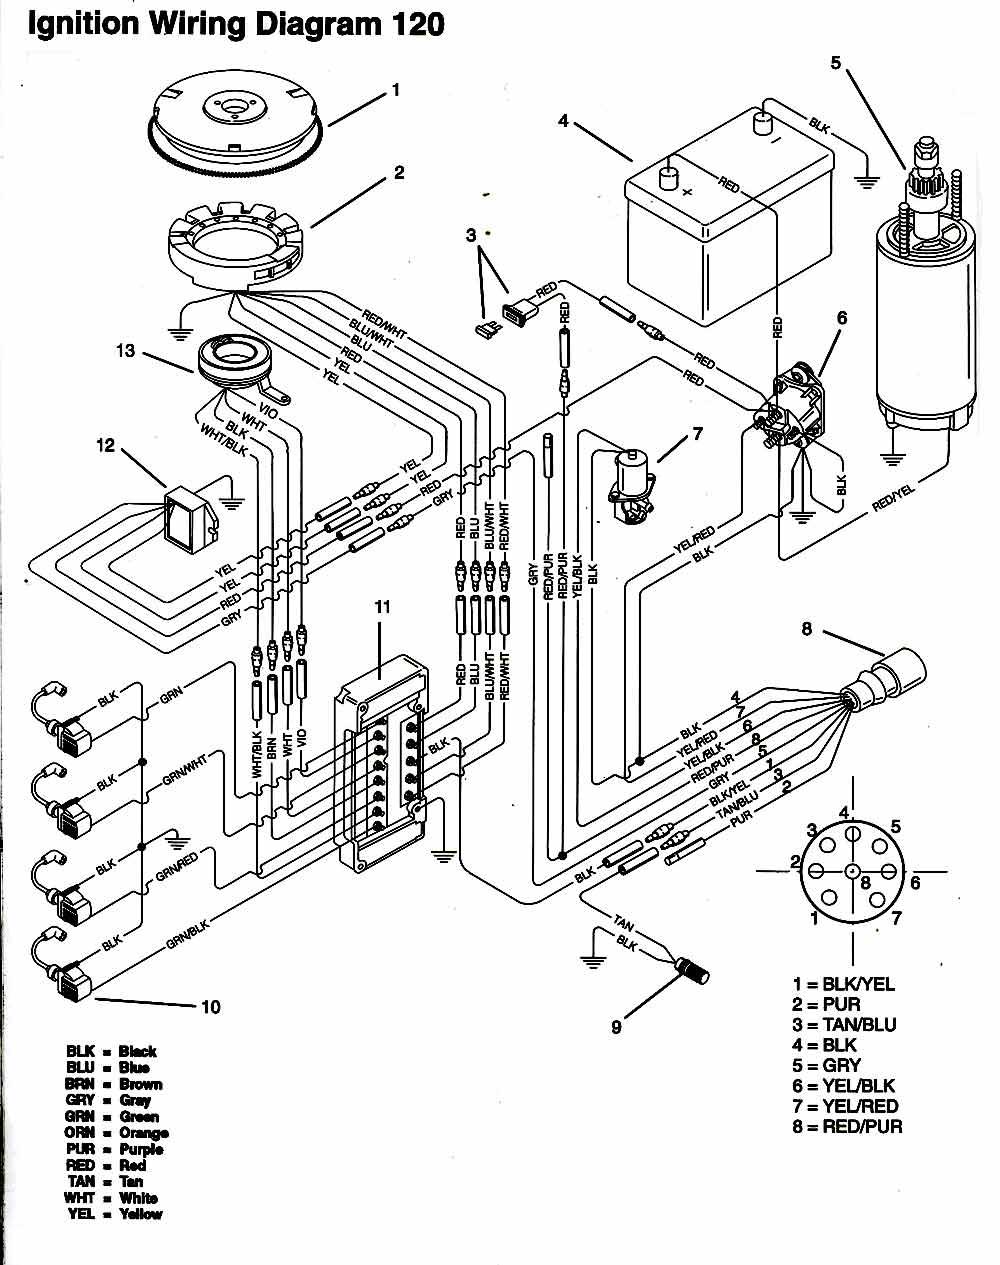 yamaha outboard motor parts diagram motorssite org chrysler 55 hp outboard wiring yamaha 150 outboard wiring diagram the